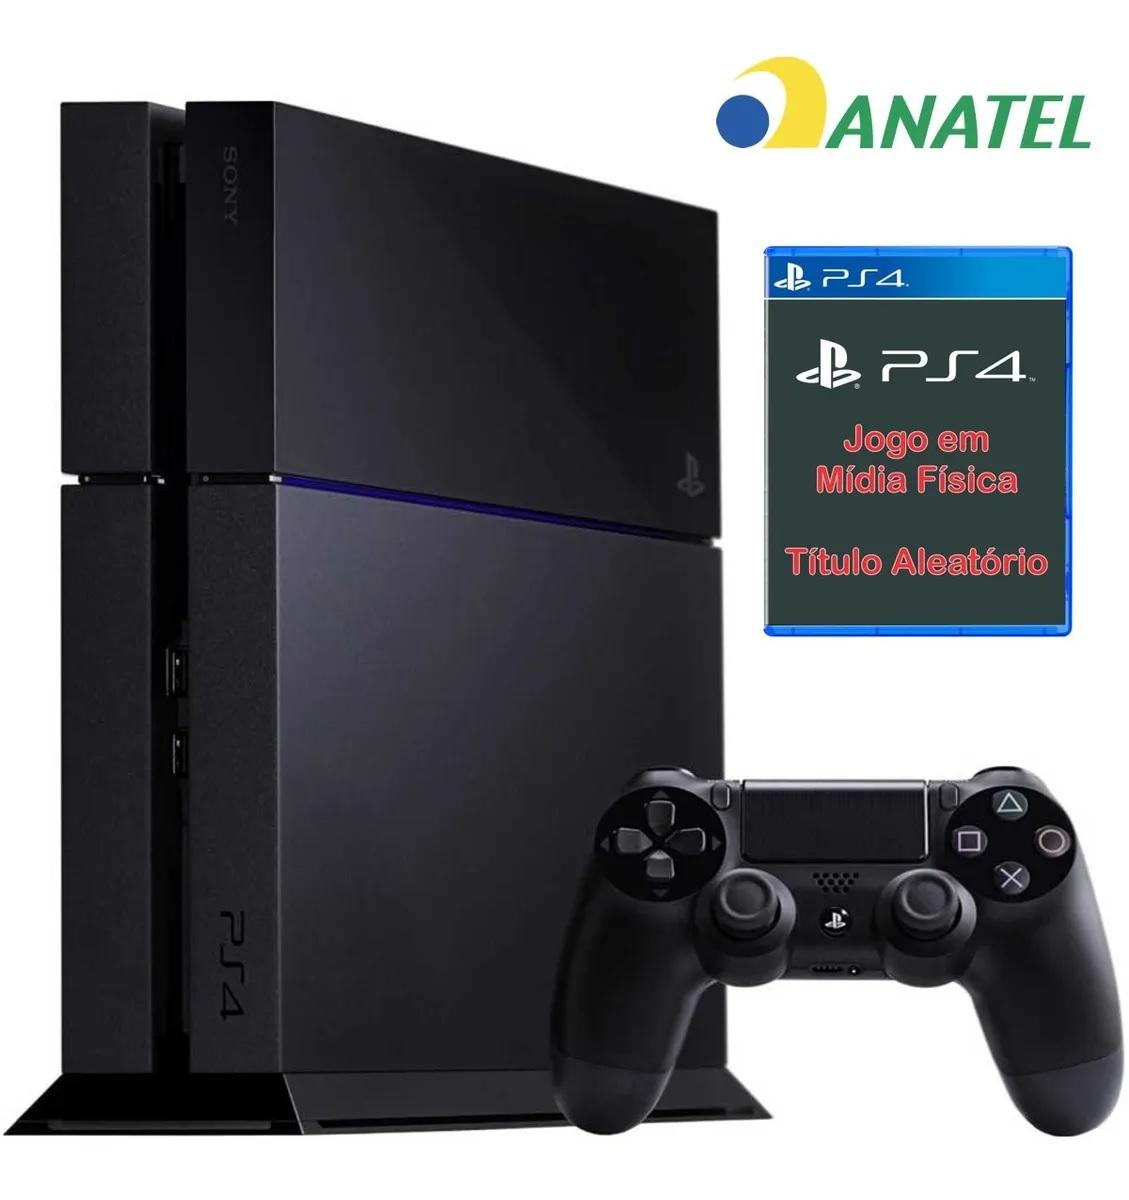 PlayStation 4 500 Gb Phat Seminovo com Brinde